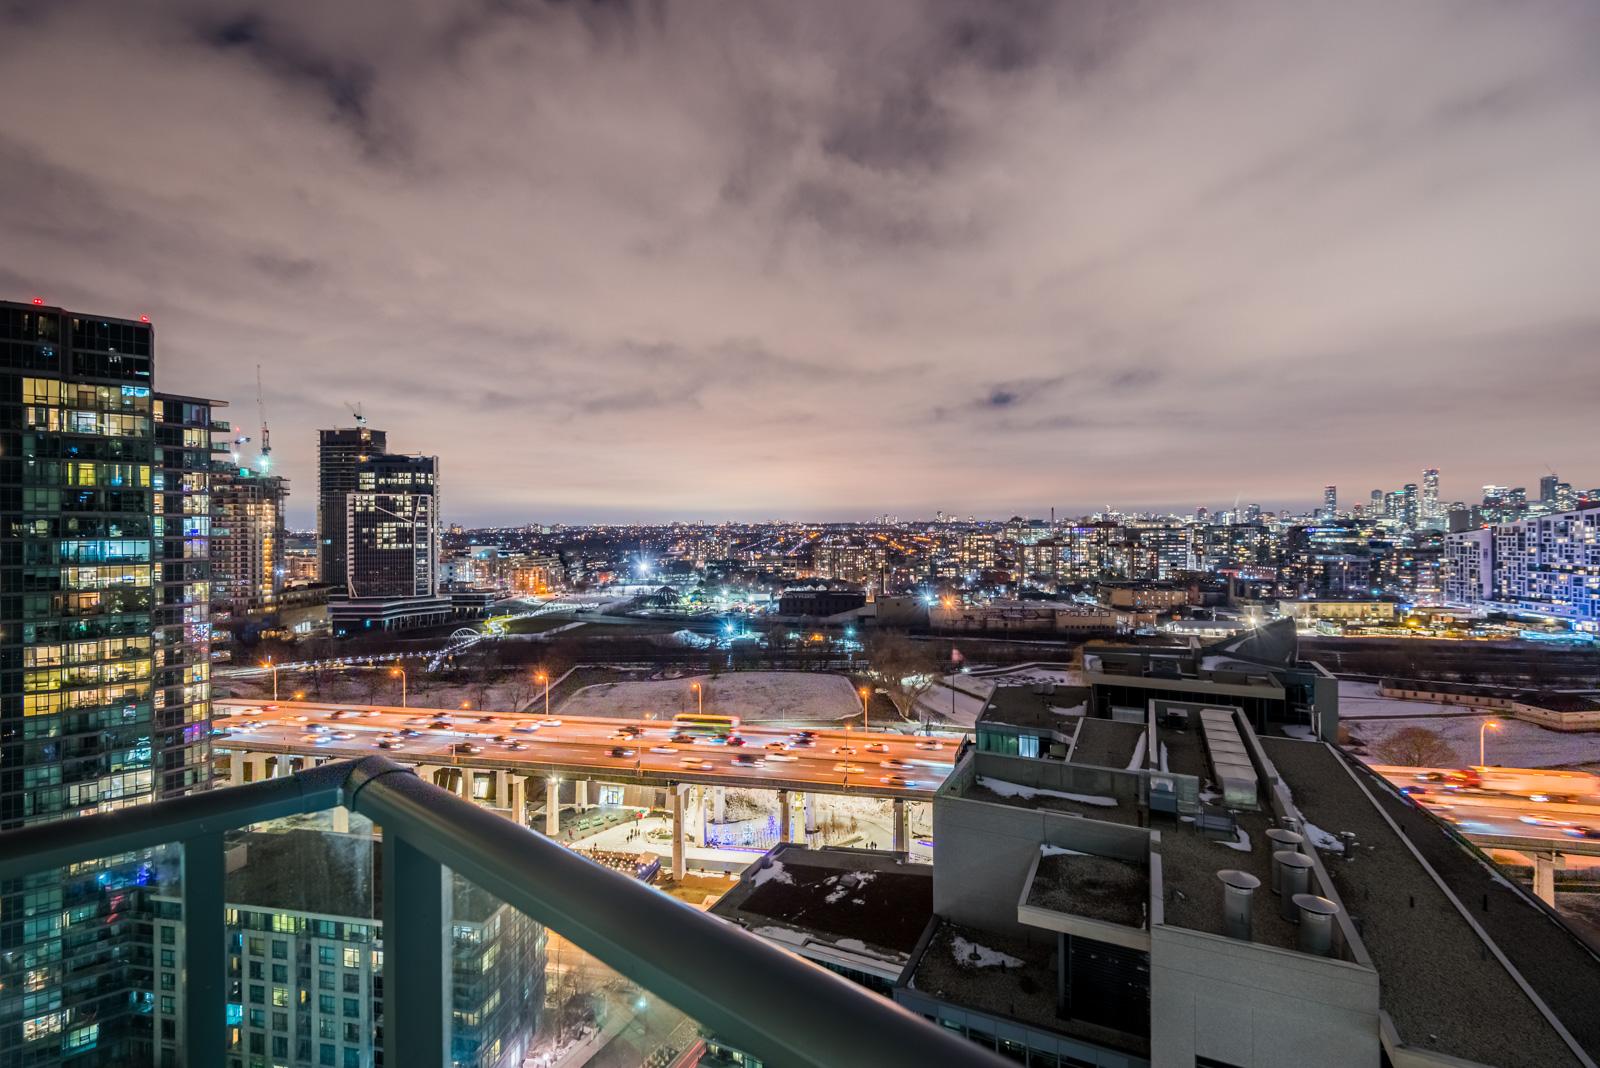 City lights of Fort York, Toronto at night from 215 Fort York Blvd Unit 2310 balcony.